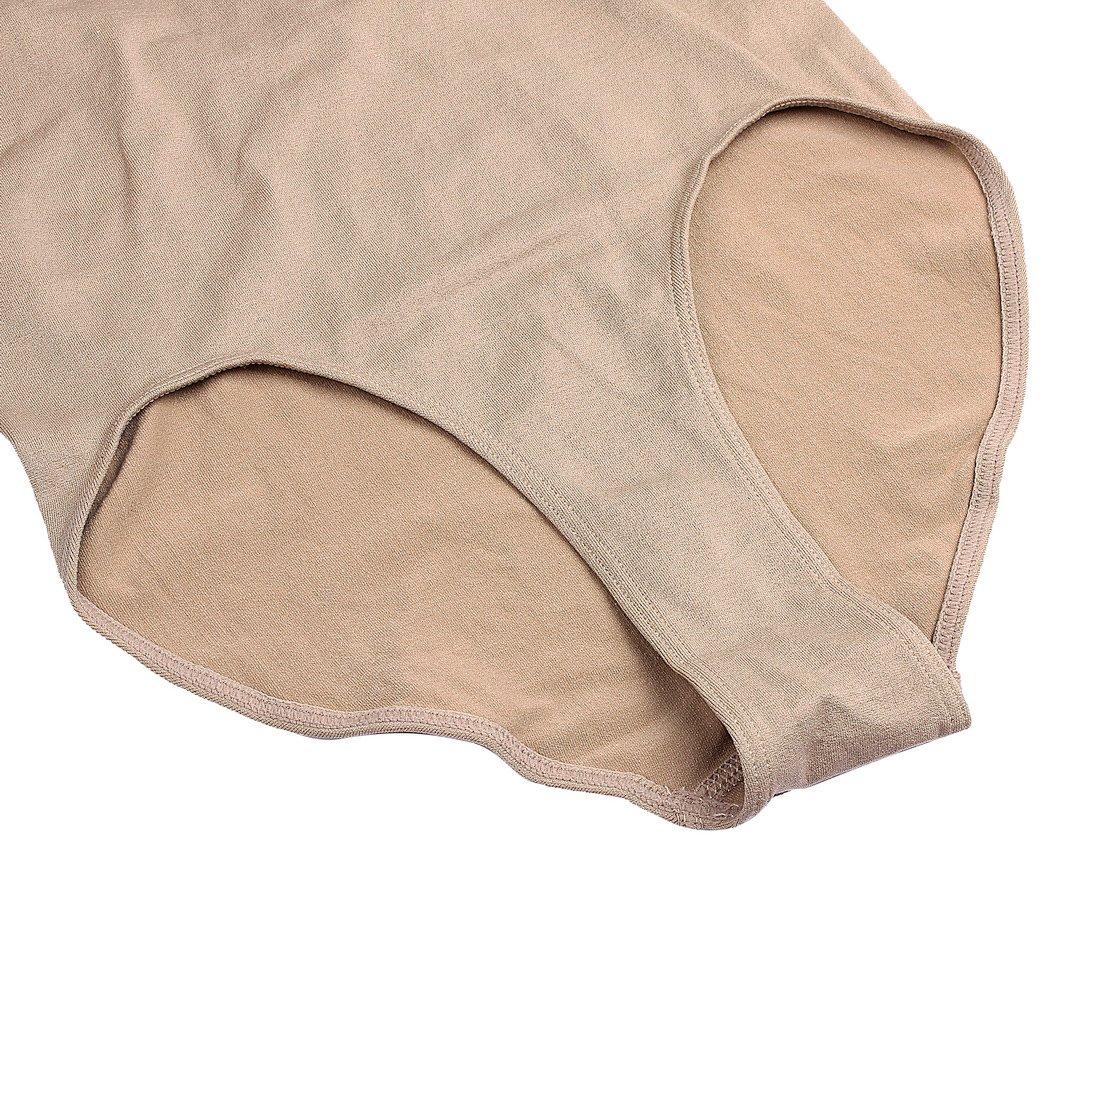 iMucci Professional Seamless Nude Camisole Leotard Undergarment Dancewear for Ballet Dance